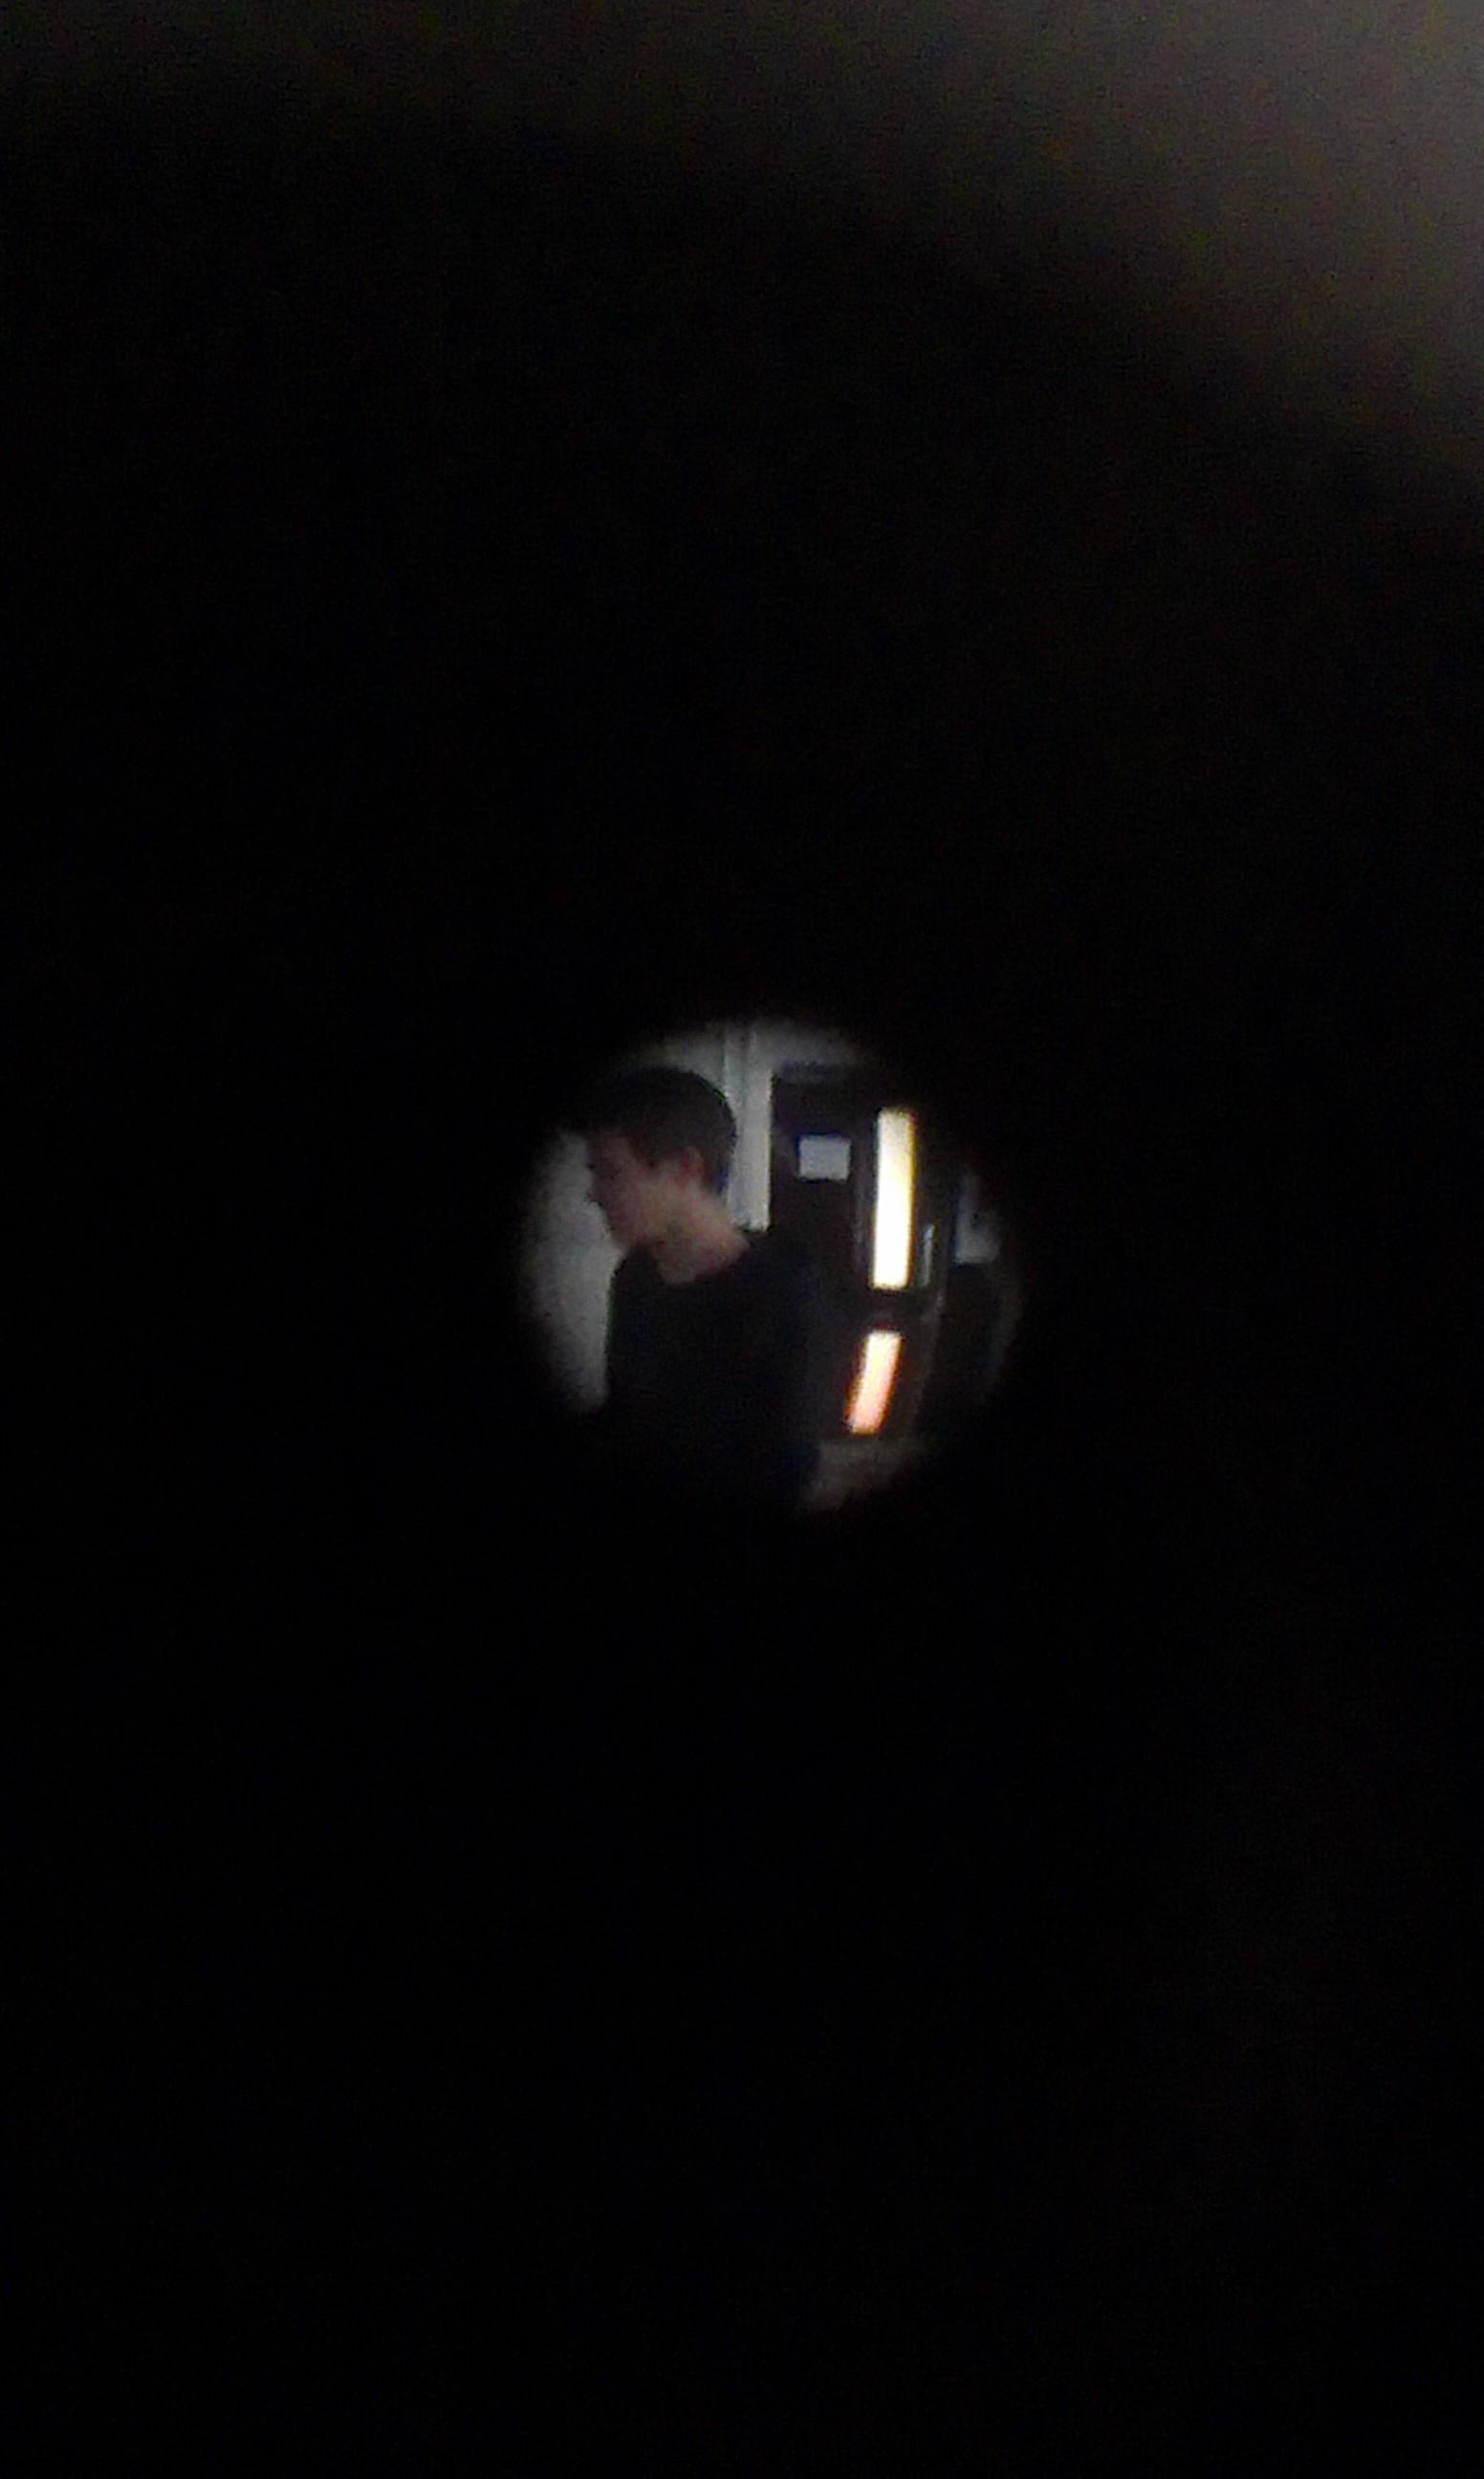 Through the Peephole Photograph 6 (2013)